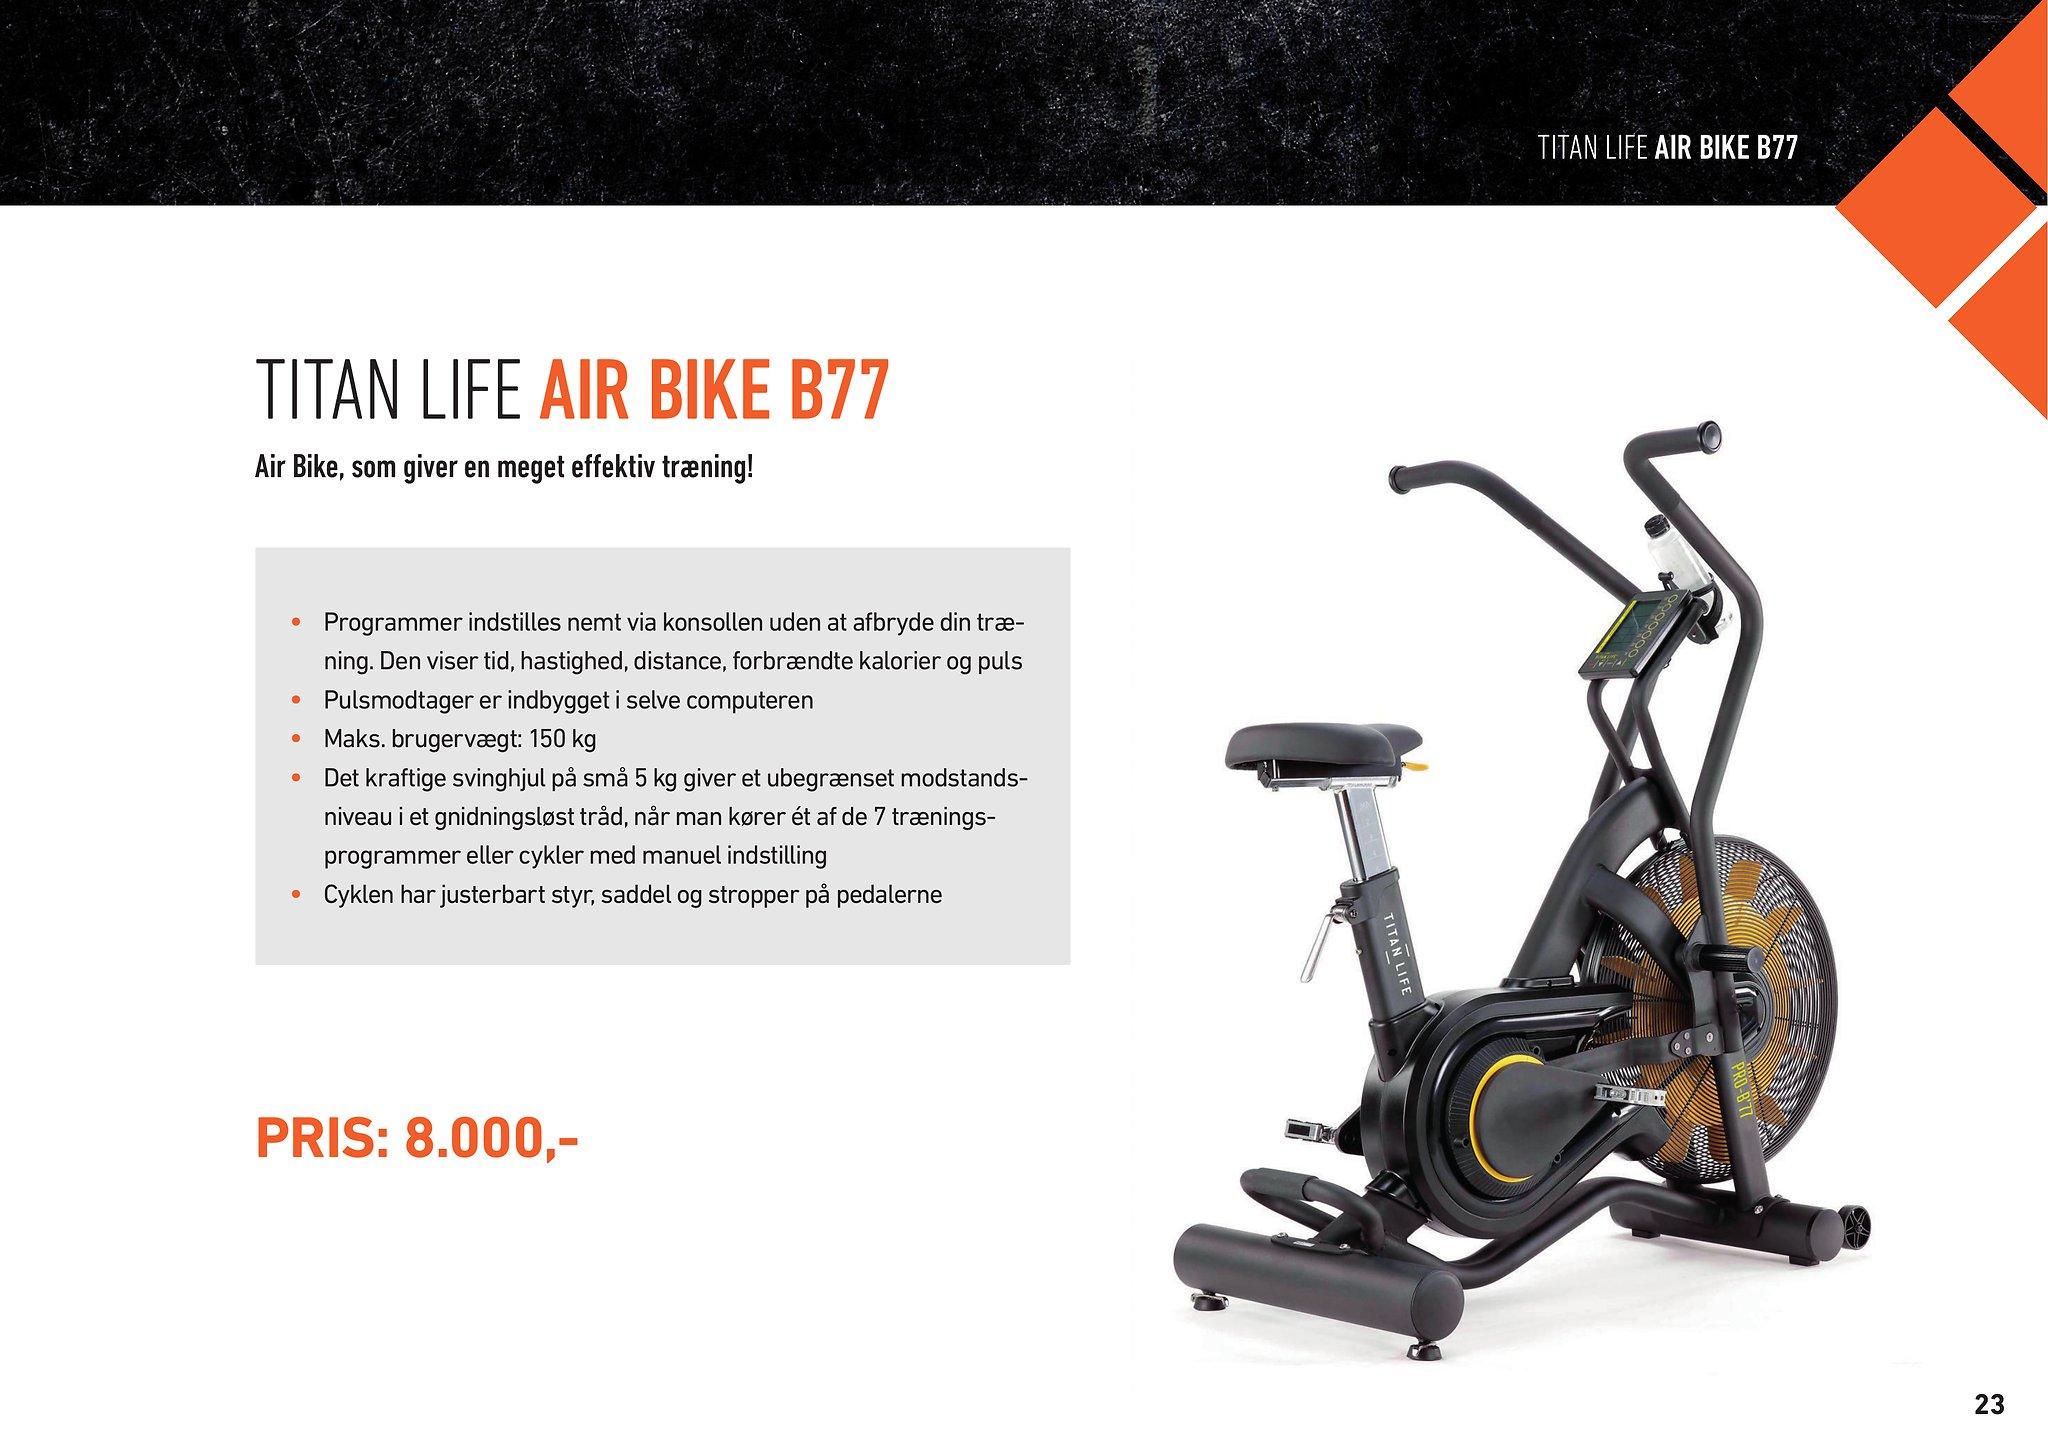 TITAN LIFE AIR BIKE B77 – HIIT – MedicSport